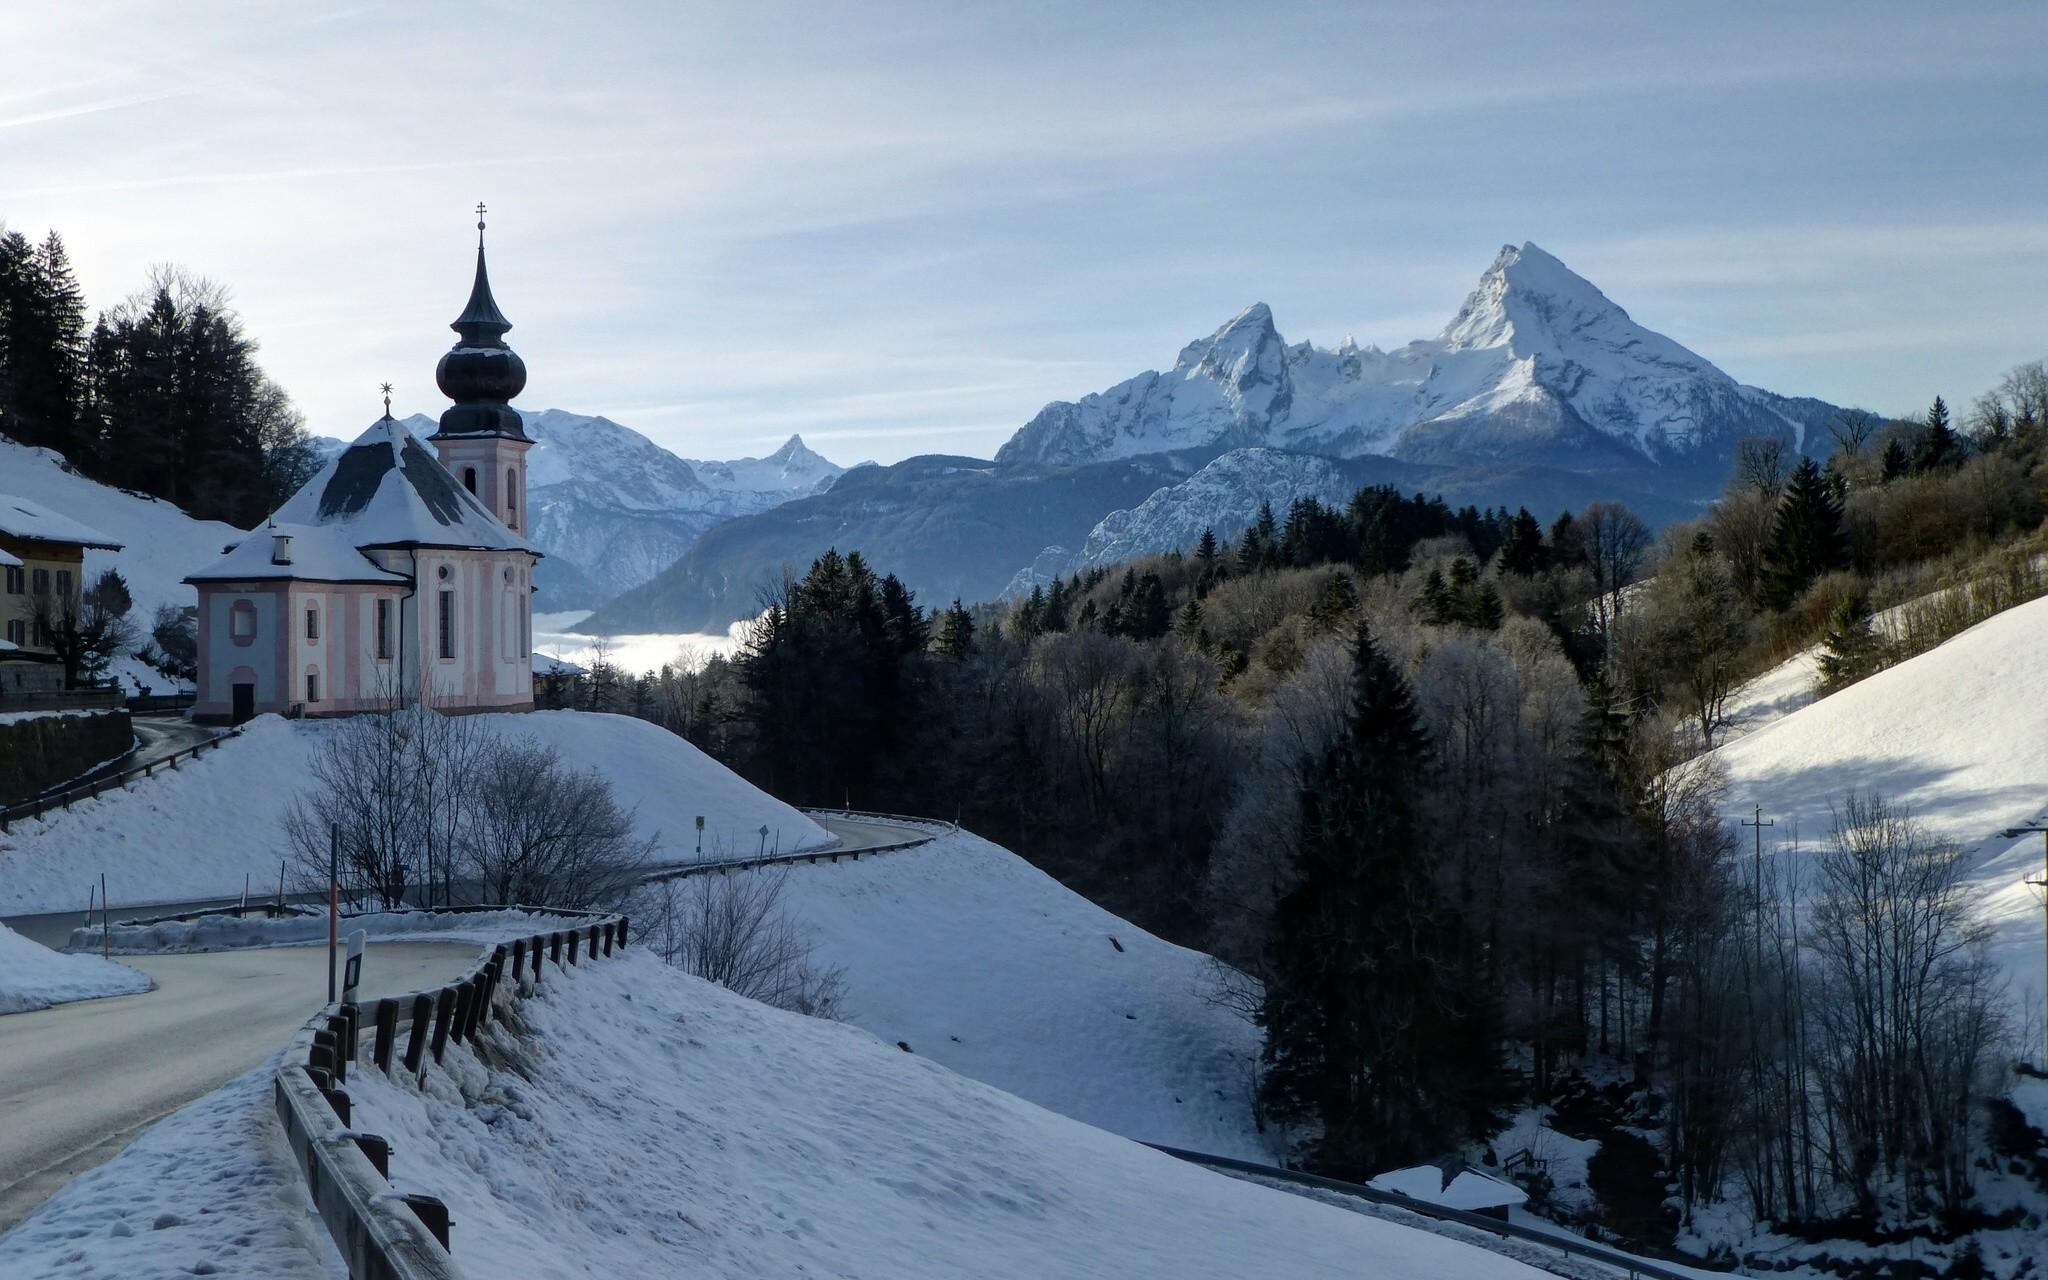 Berchtesgaden Bavaria Germany Bavarian Alps Mount Watzmann winter road  forest landscape mountains Alps Church wallpaper background